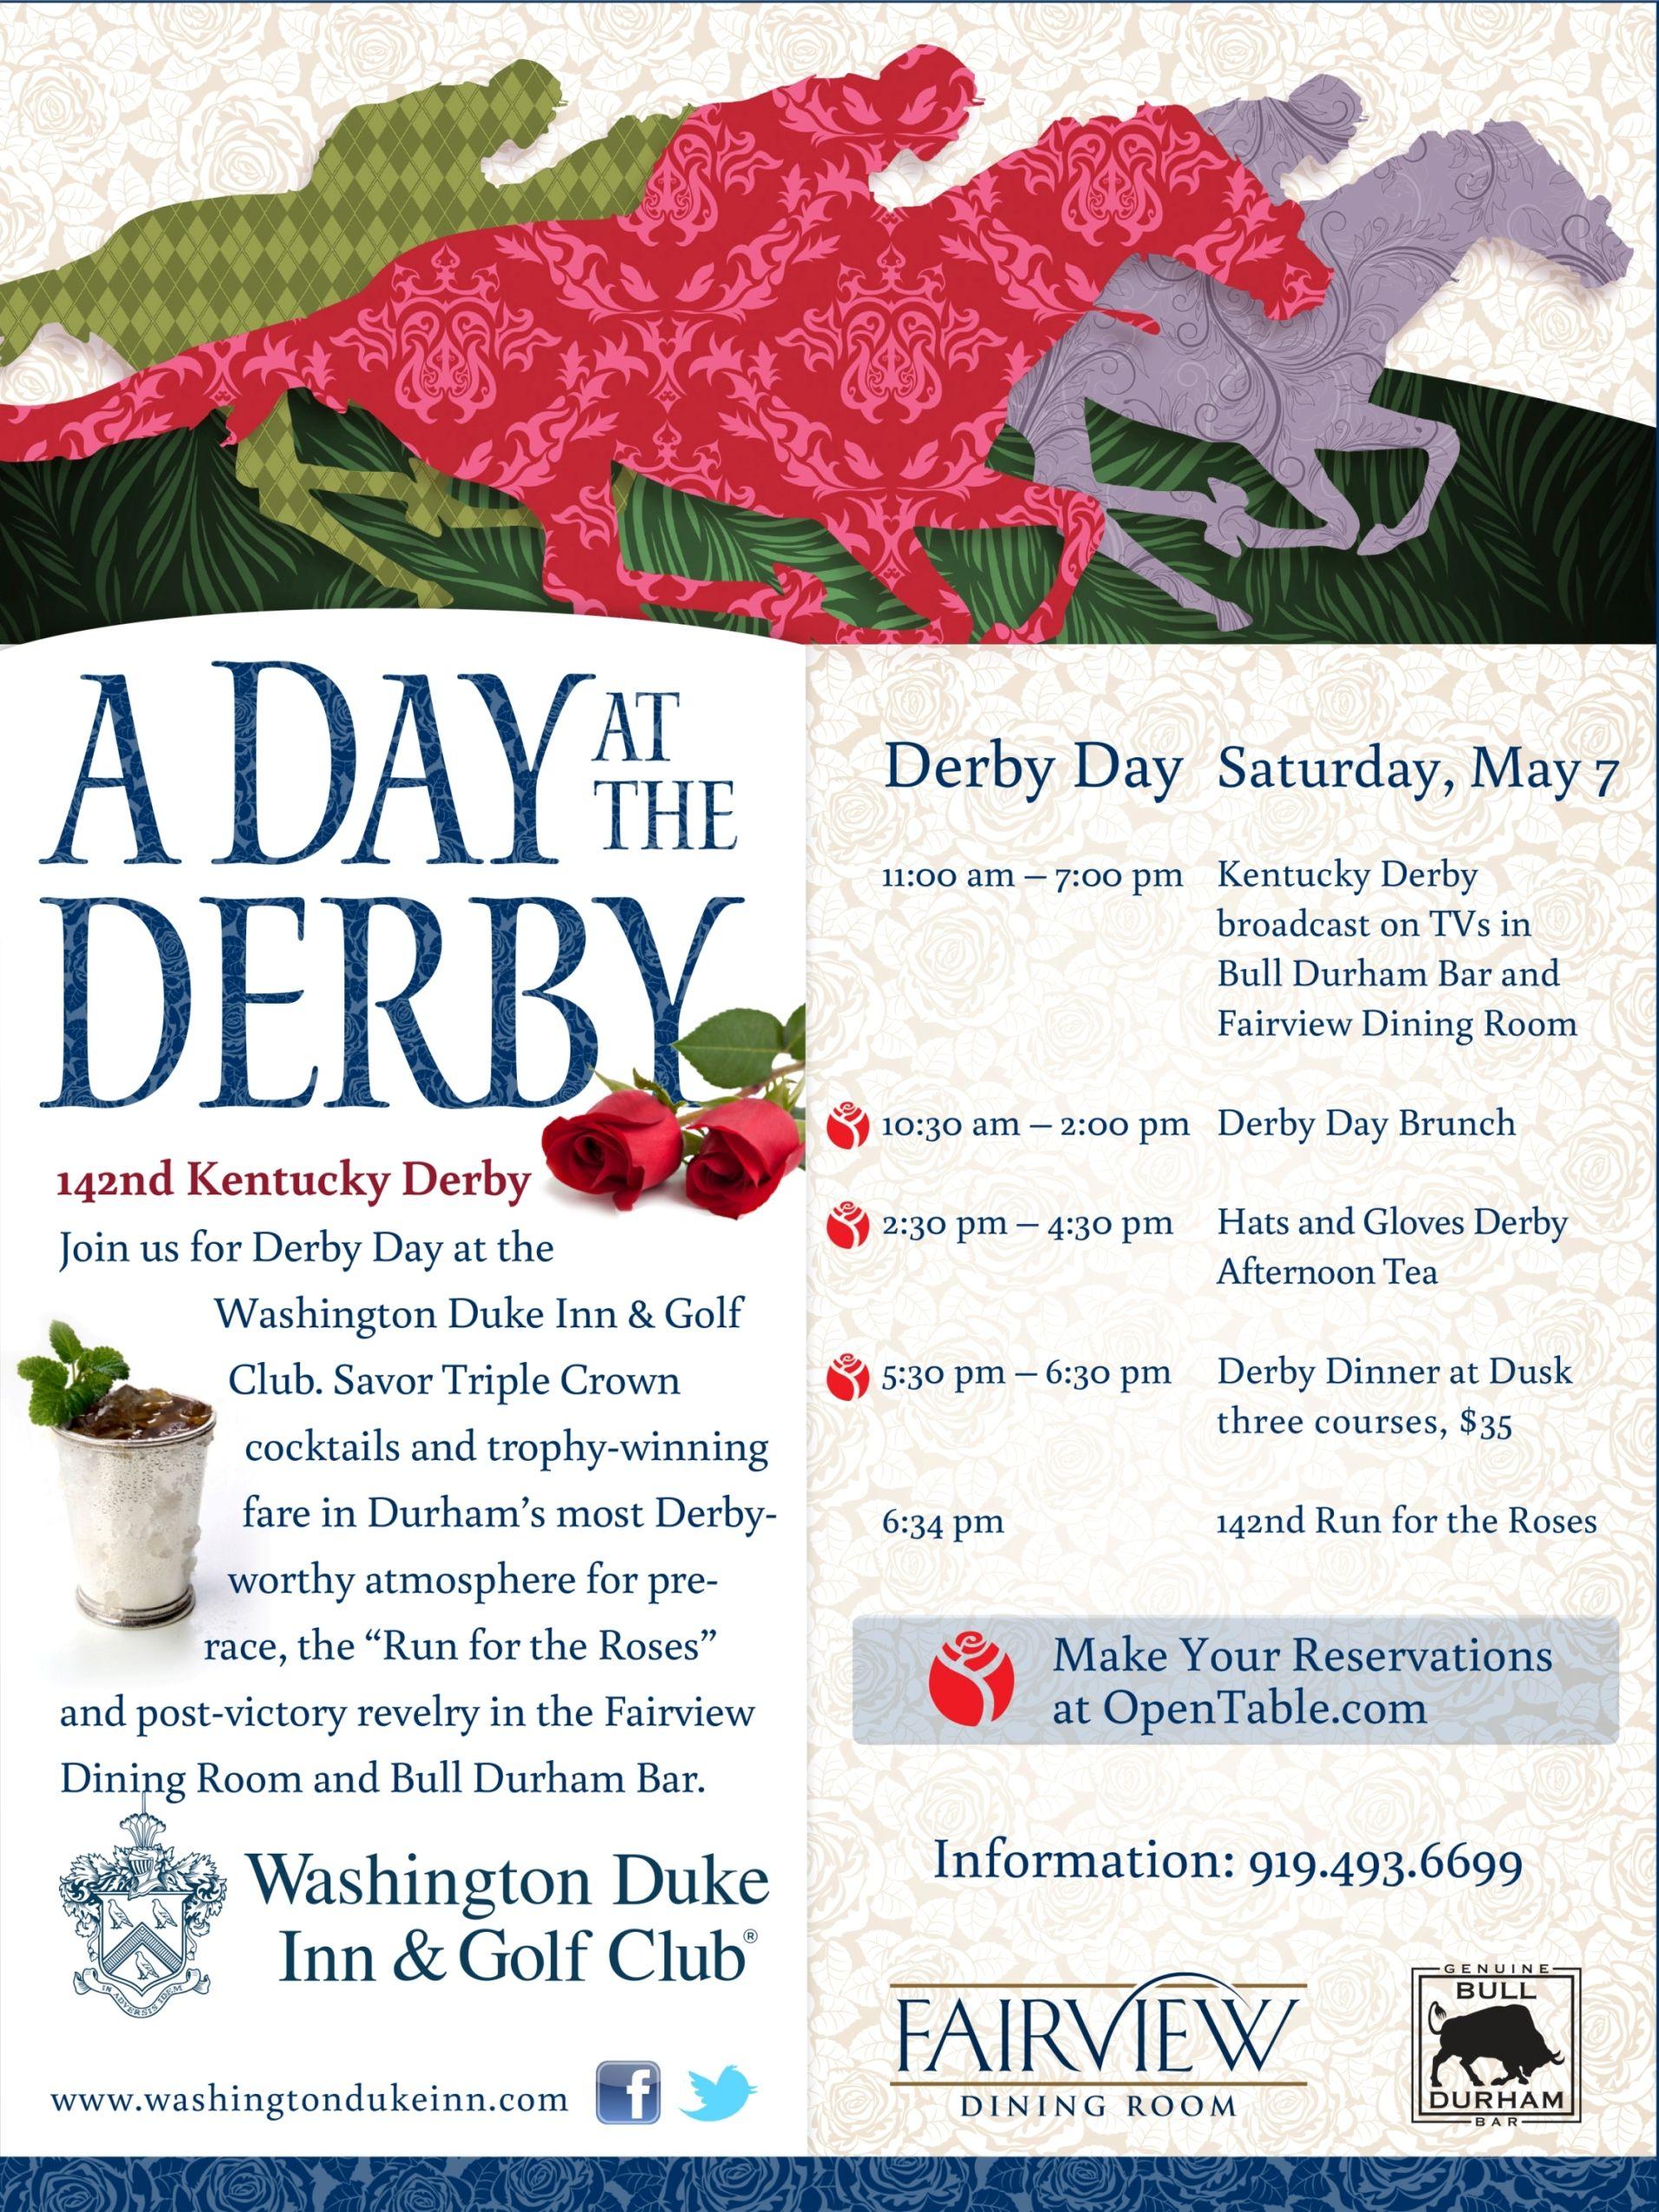 Derbydays  Bull Durham Bar  Pinterest Enchanting Fairview Dining Room Inspiration Design